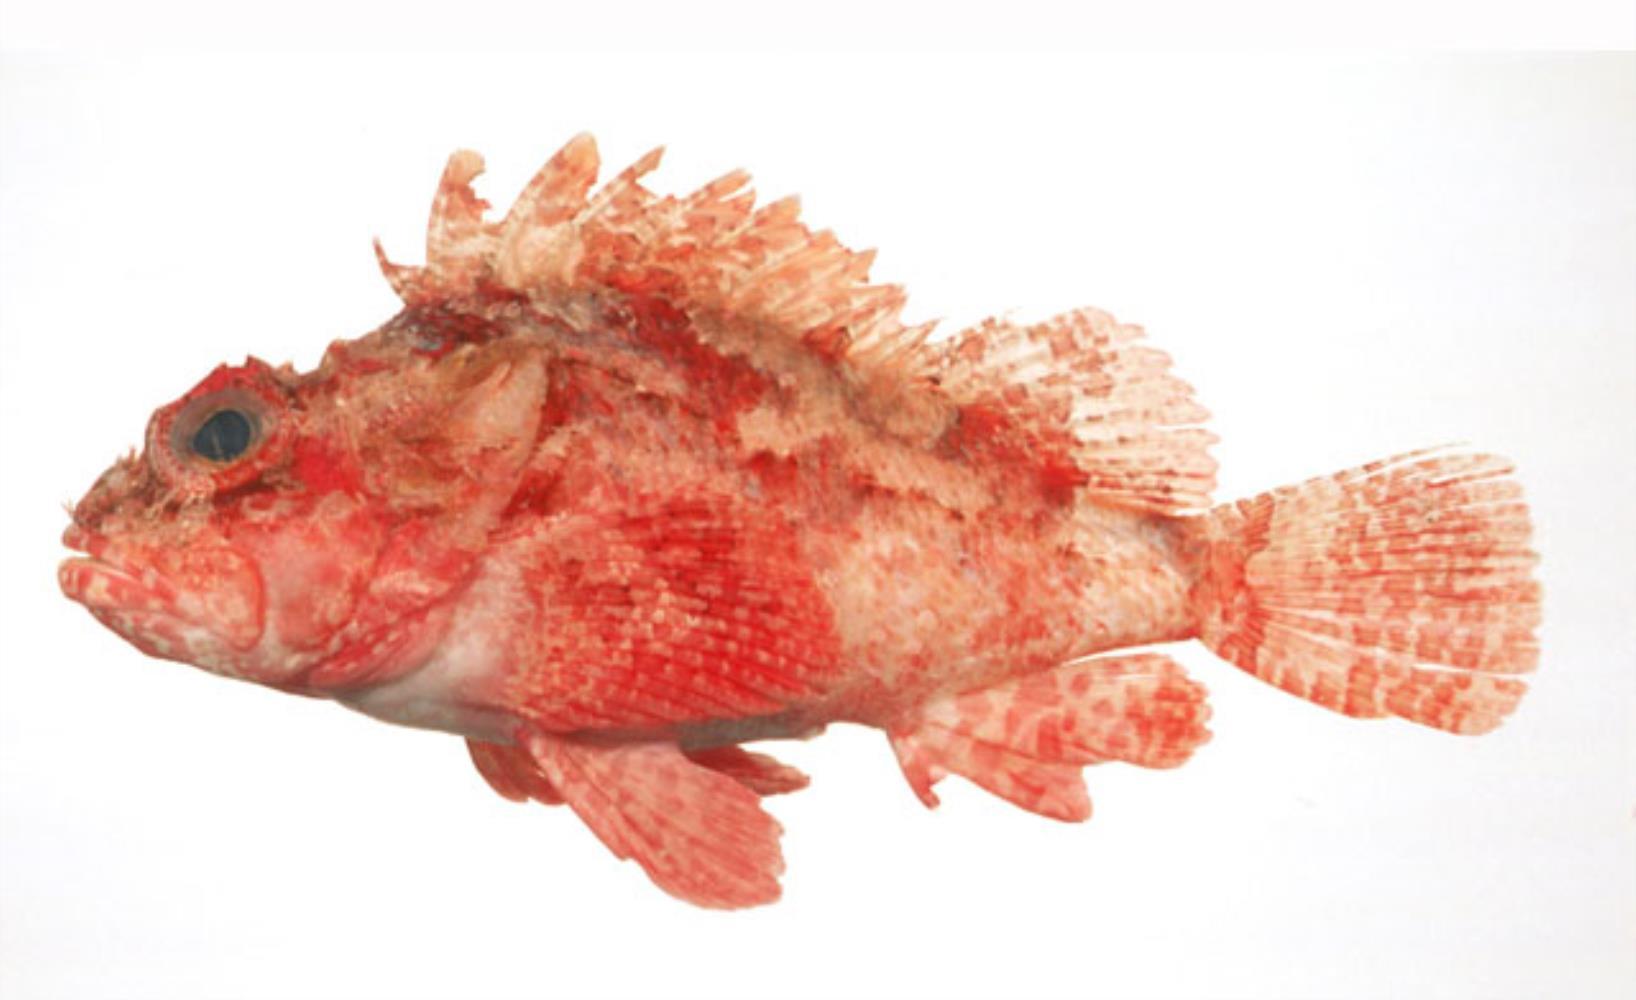 Western Scorpionfish